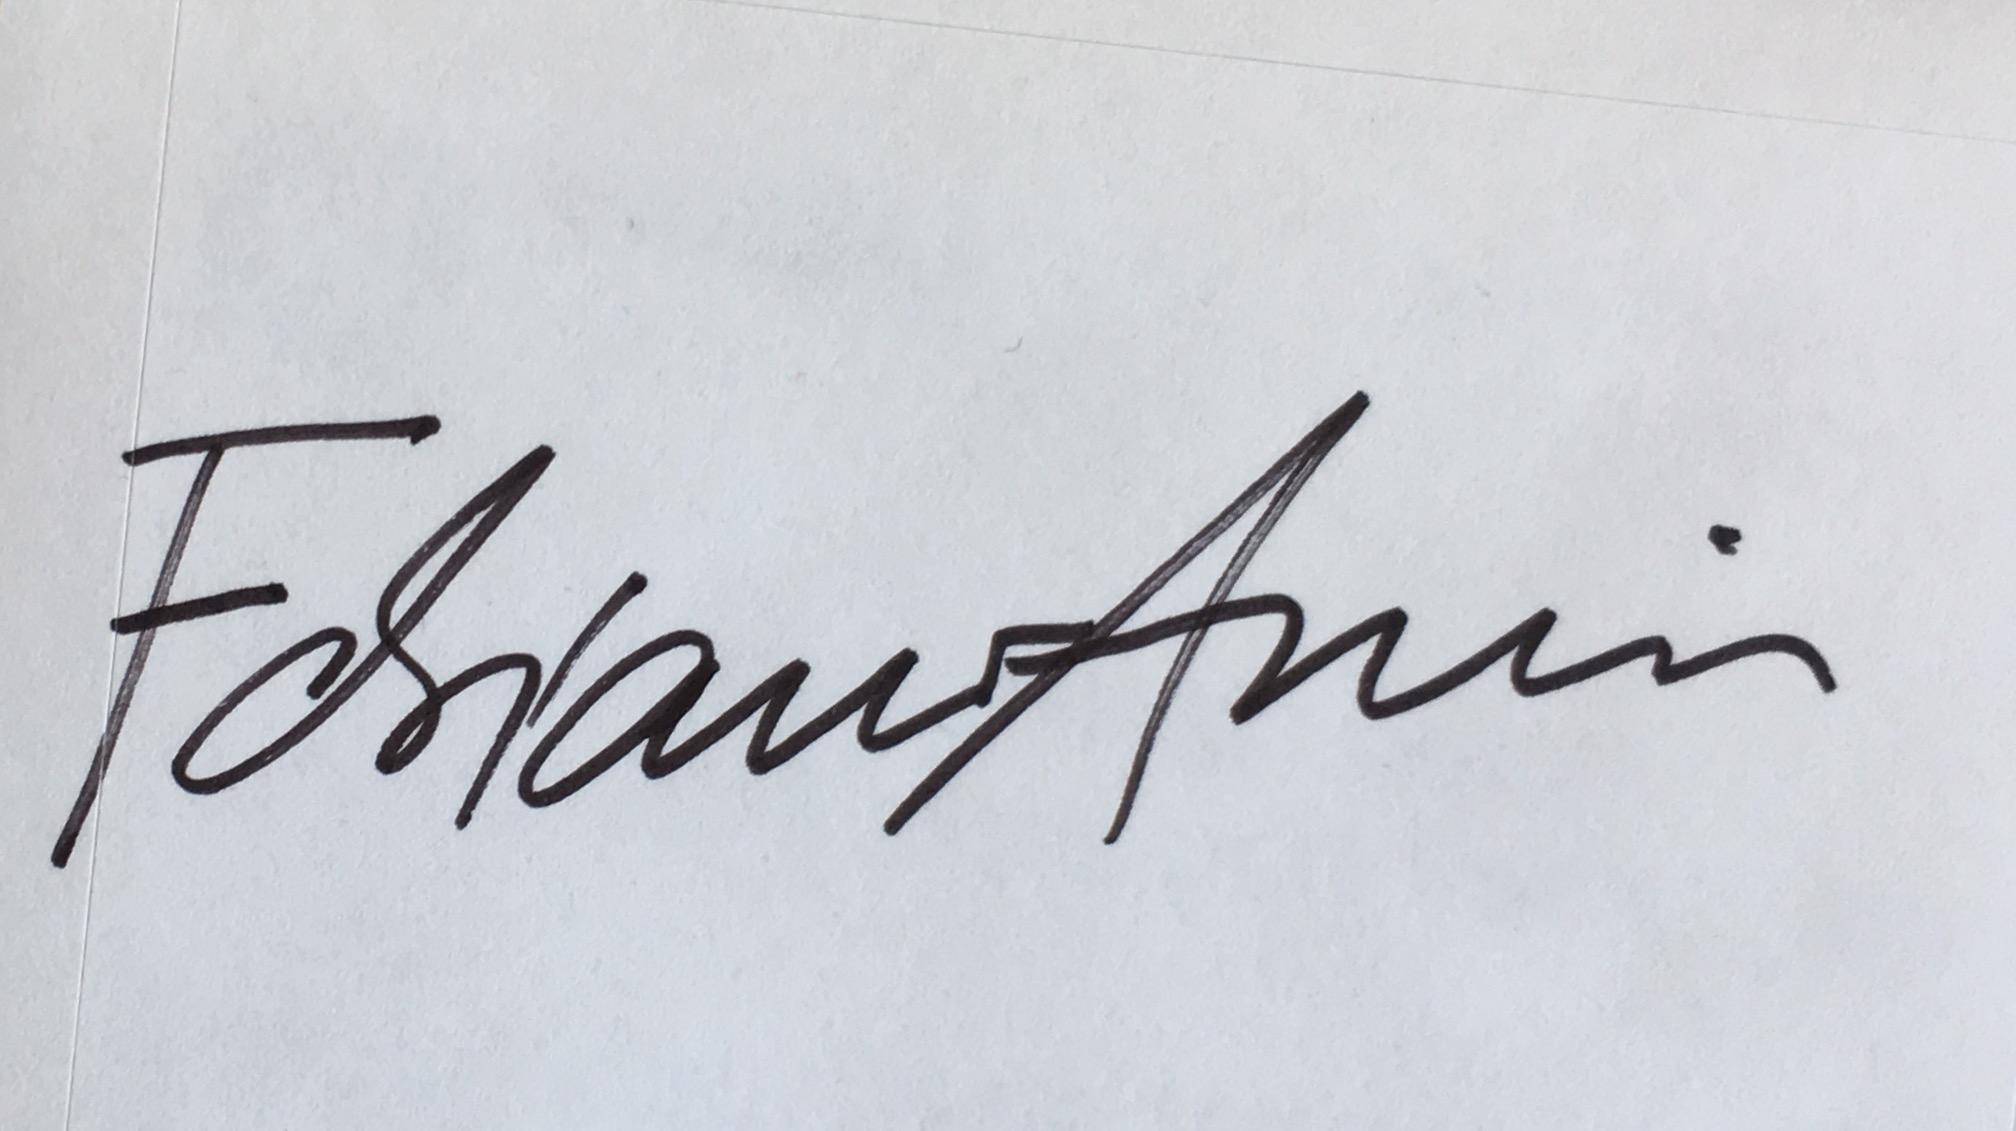 Fabiano Amin's Signature